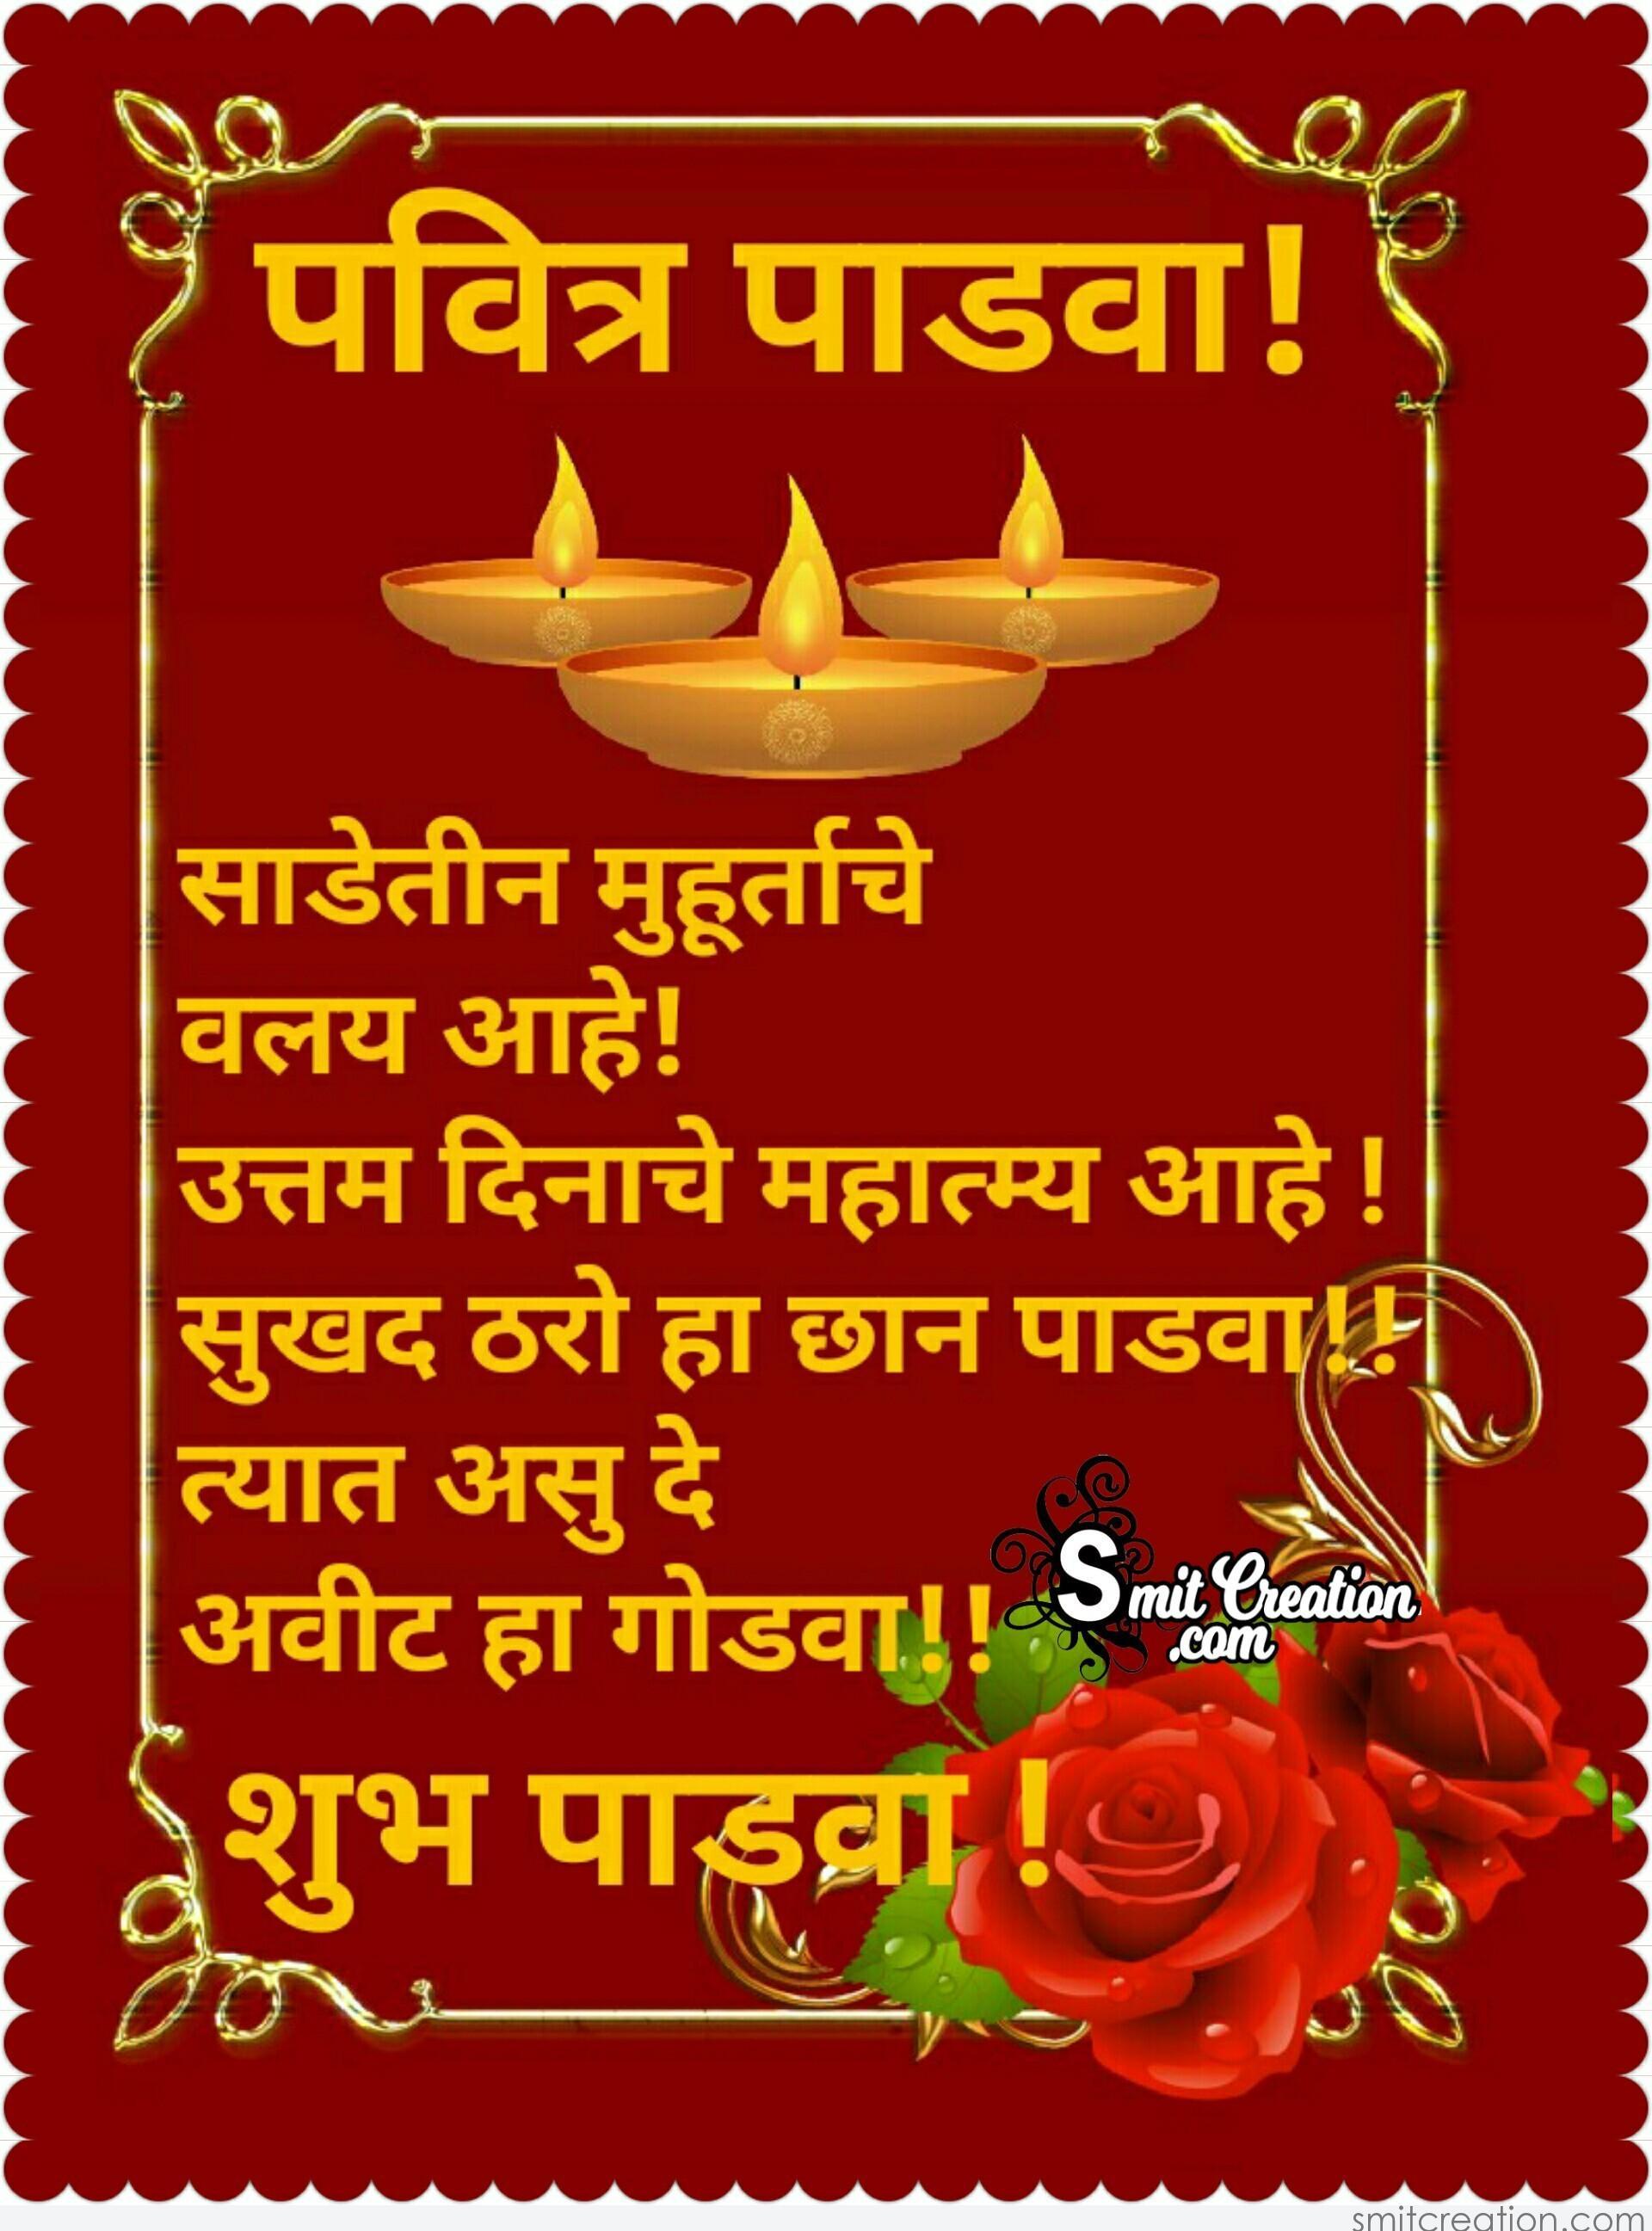 Diwali Padwa Wishes In Marathi Tumblr thumbnail